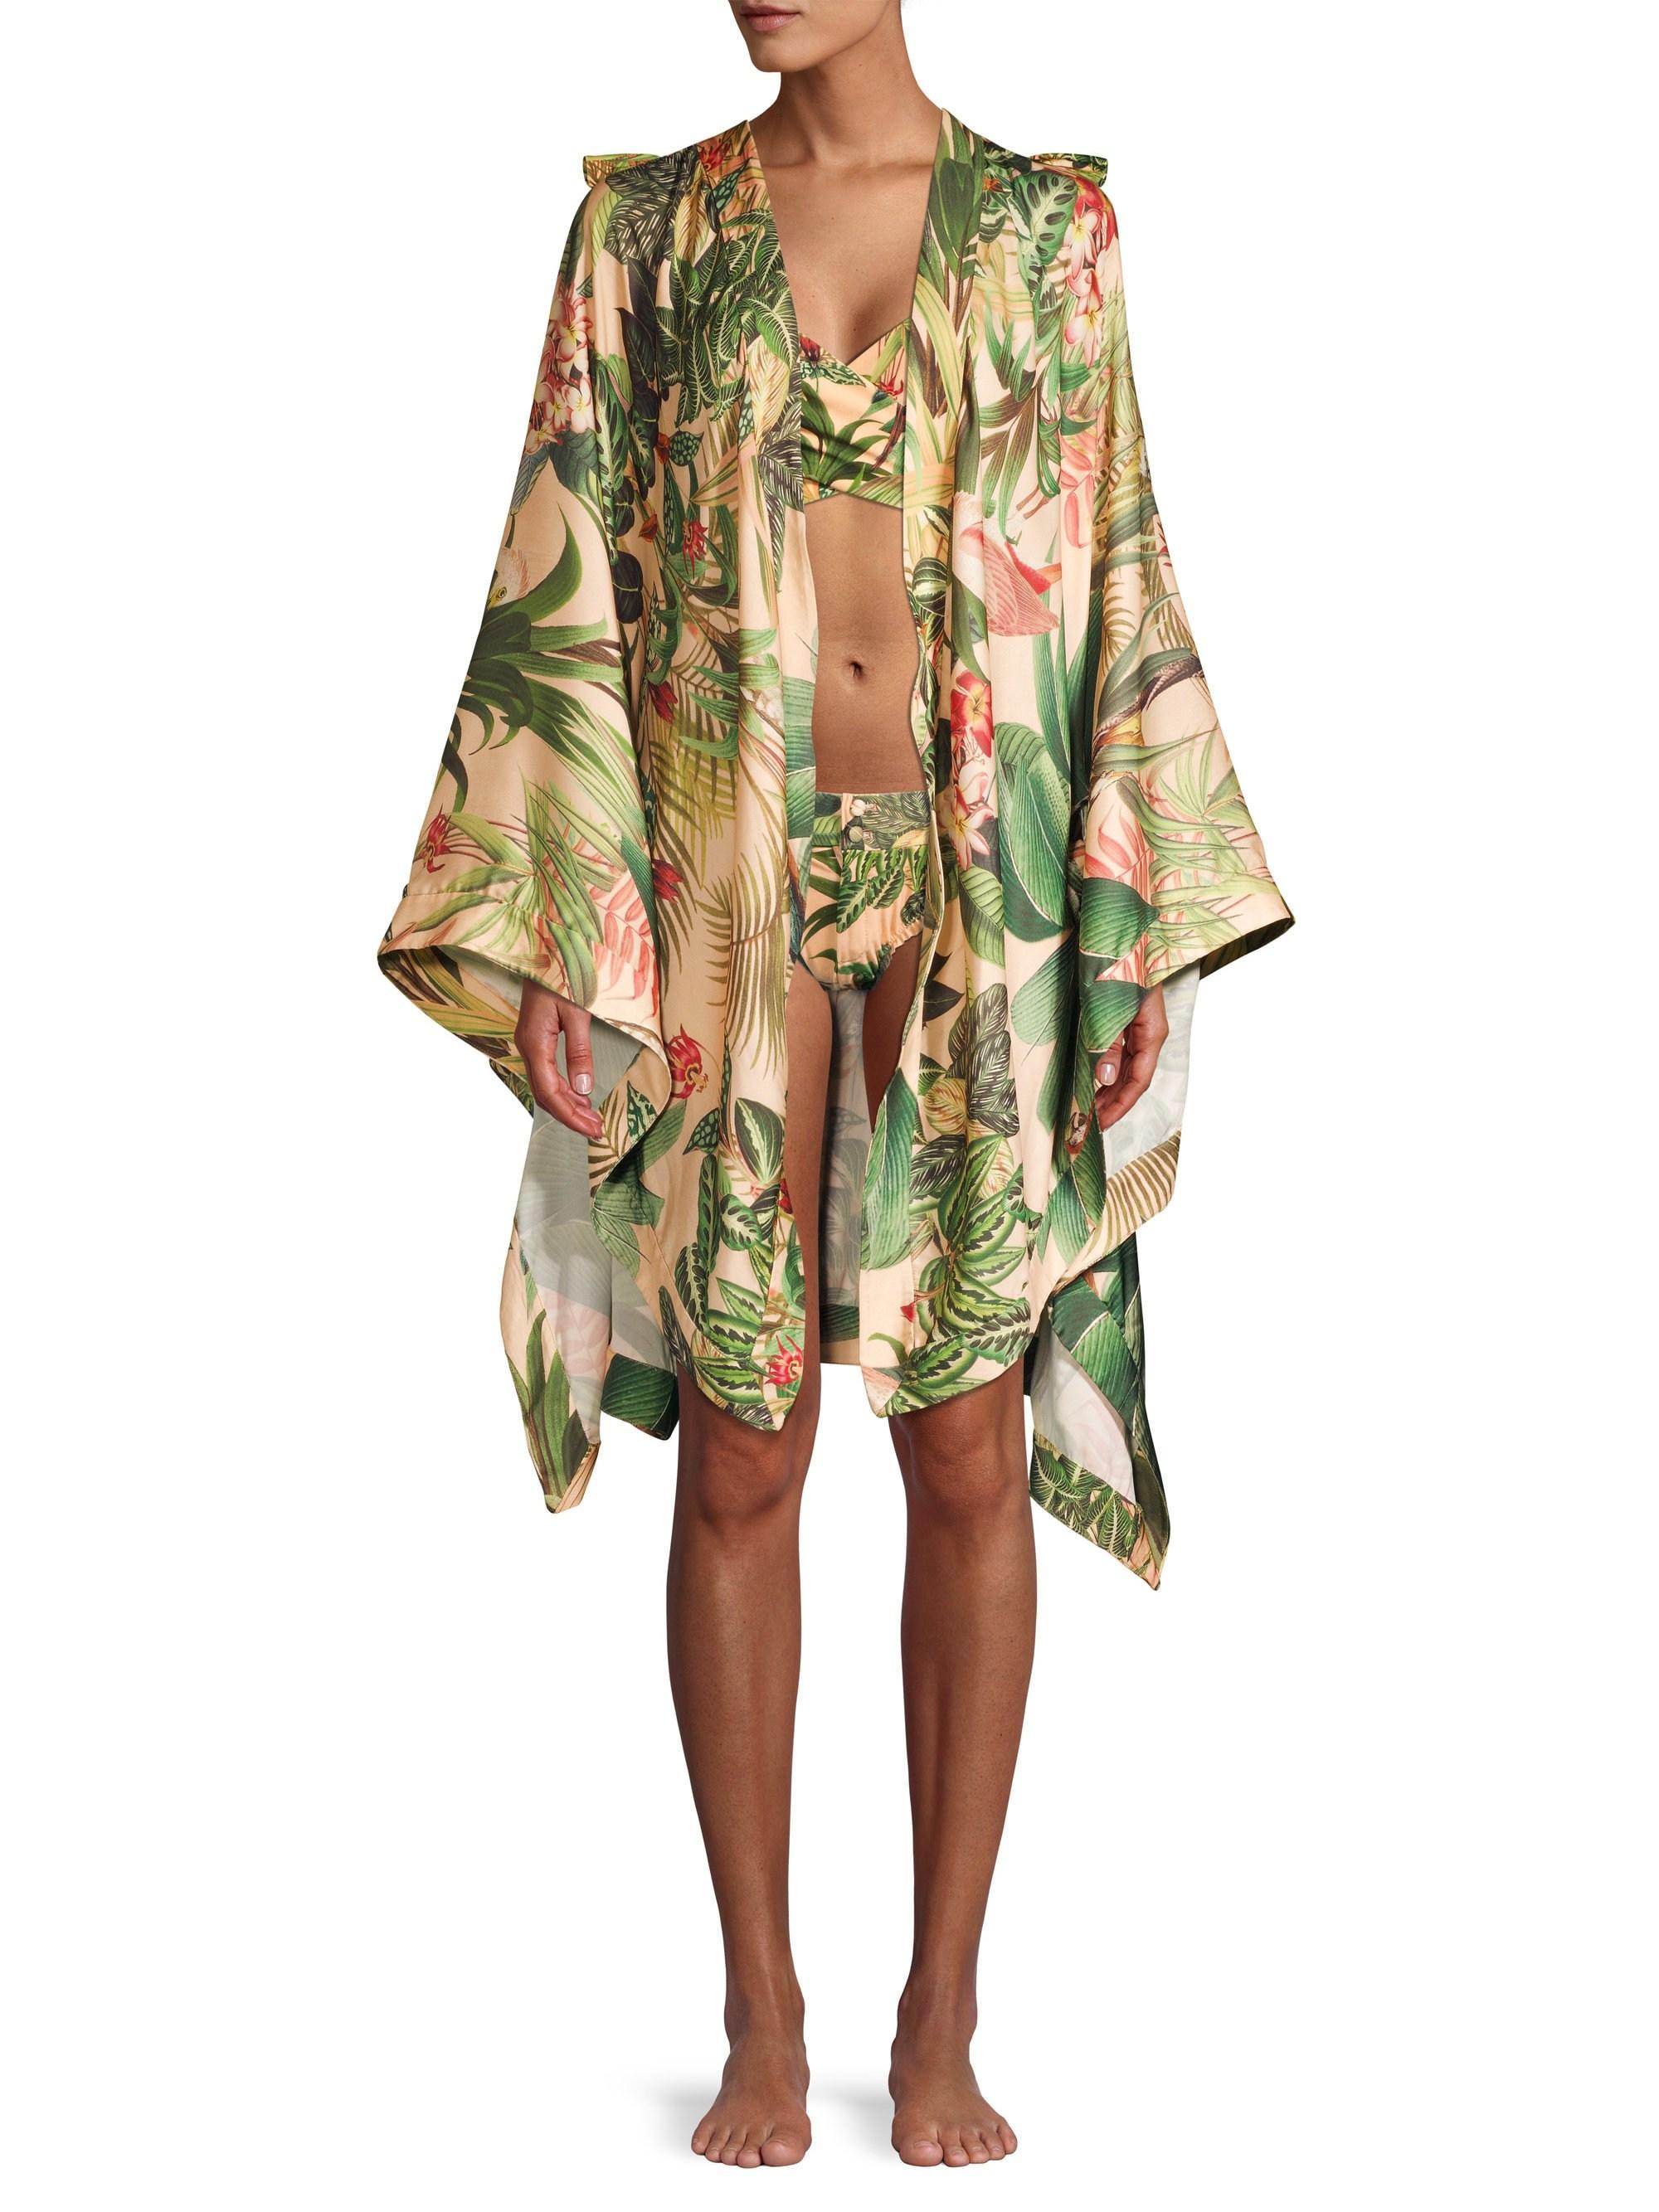 PatBO Women's Paradise Print Kimono – Pink